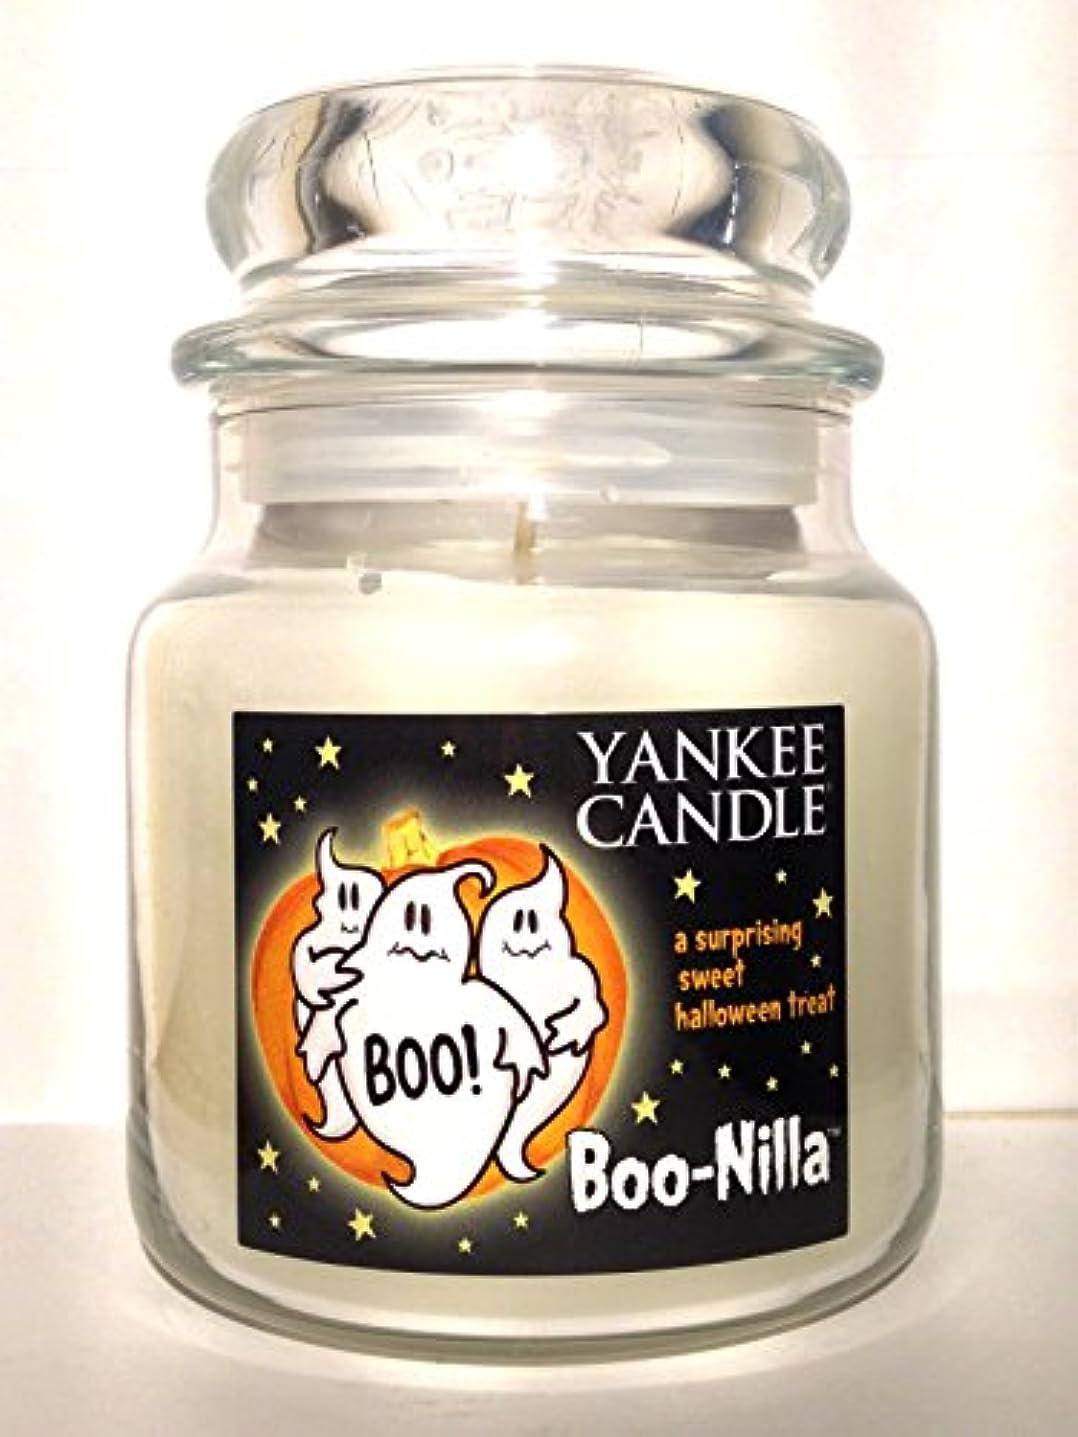 Yankee Candle boo-nilla Boonilla Vanilla Marshmallow香りHalloween Candle